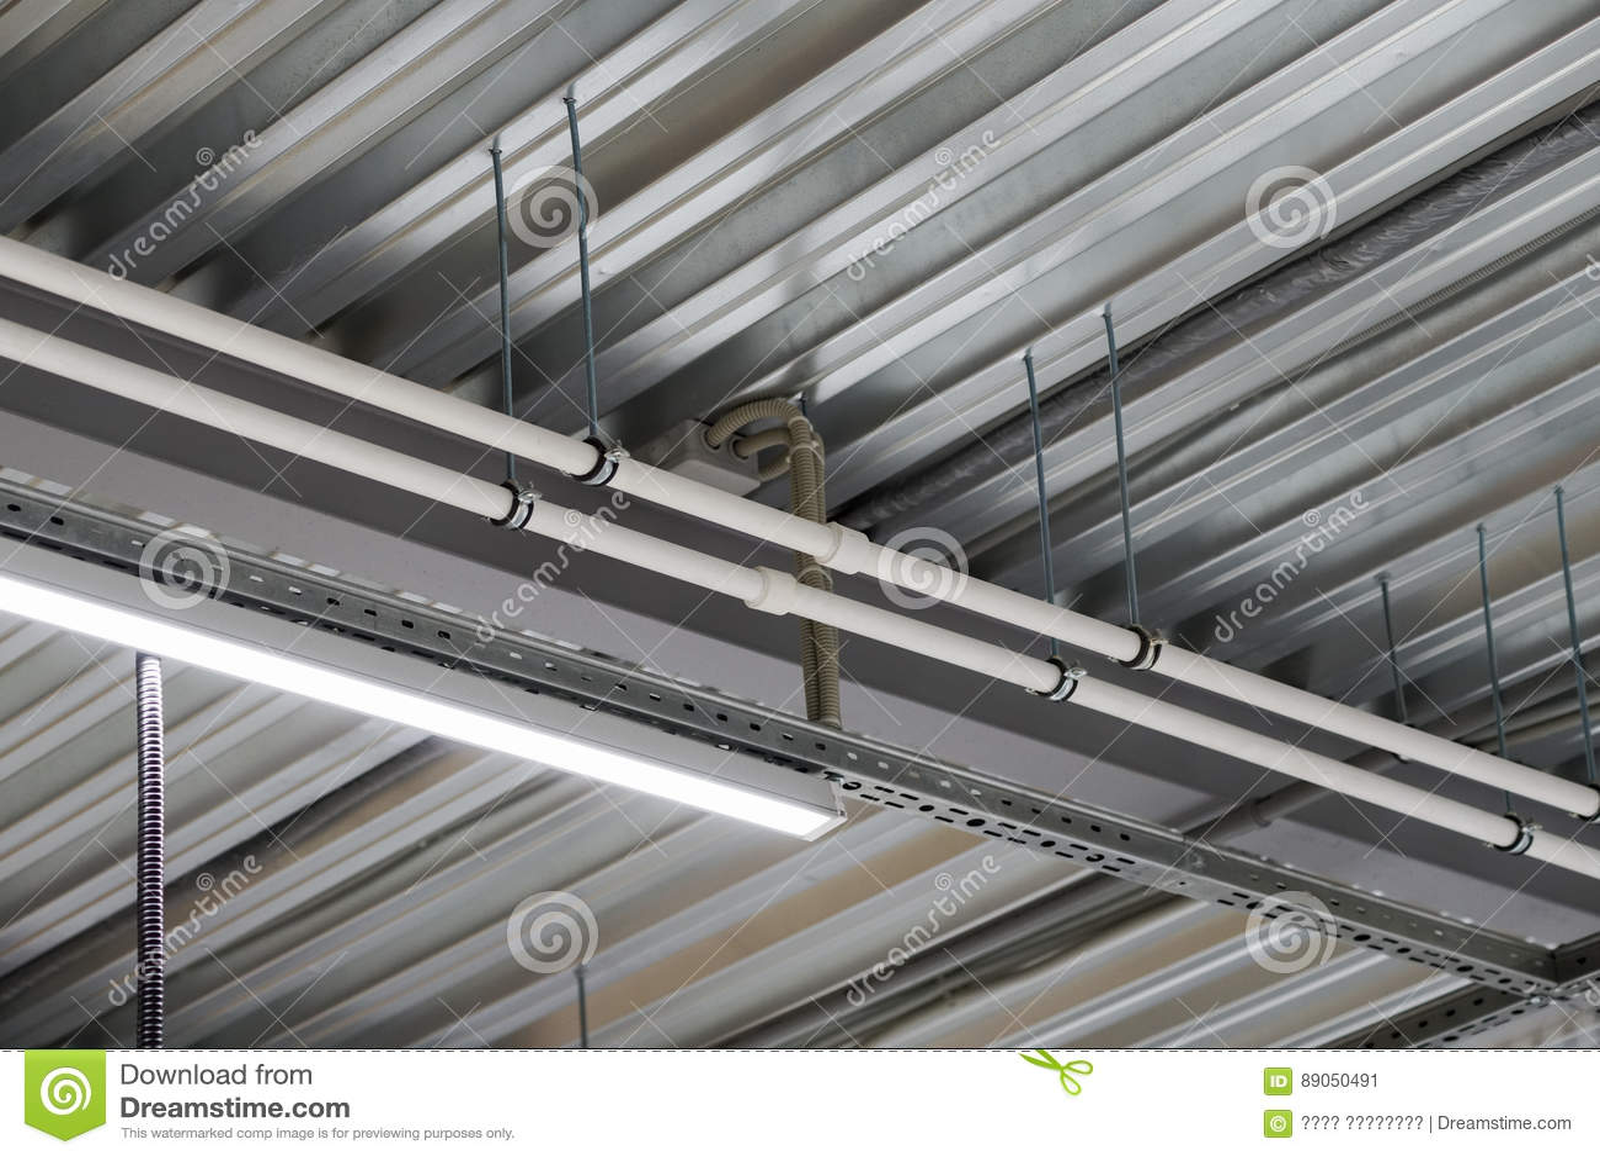 Installation De Plafond Suspendu Dappareils Déclairage Image Stock